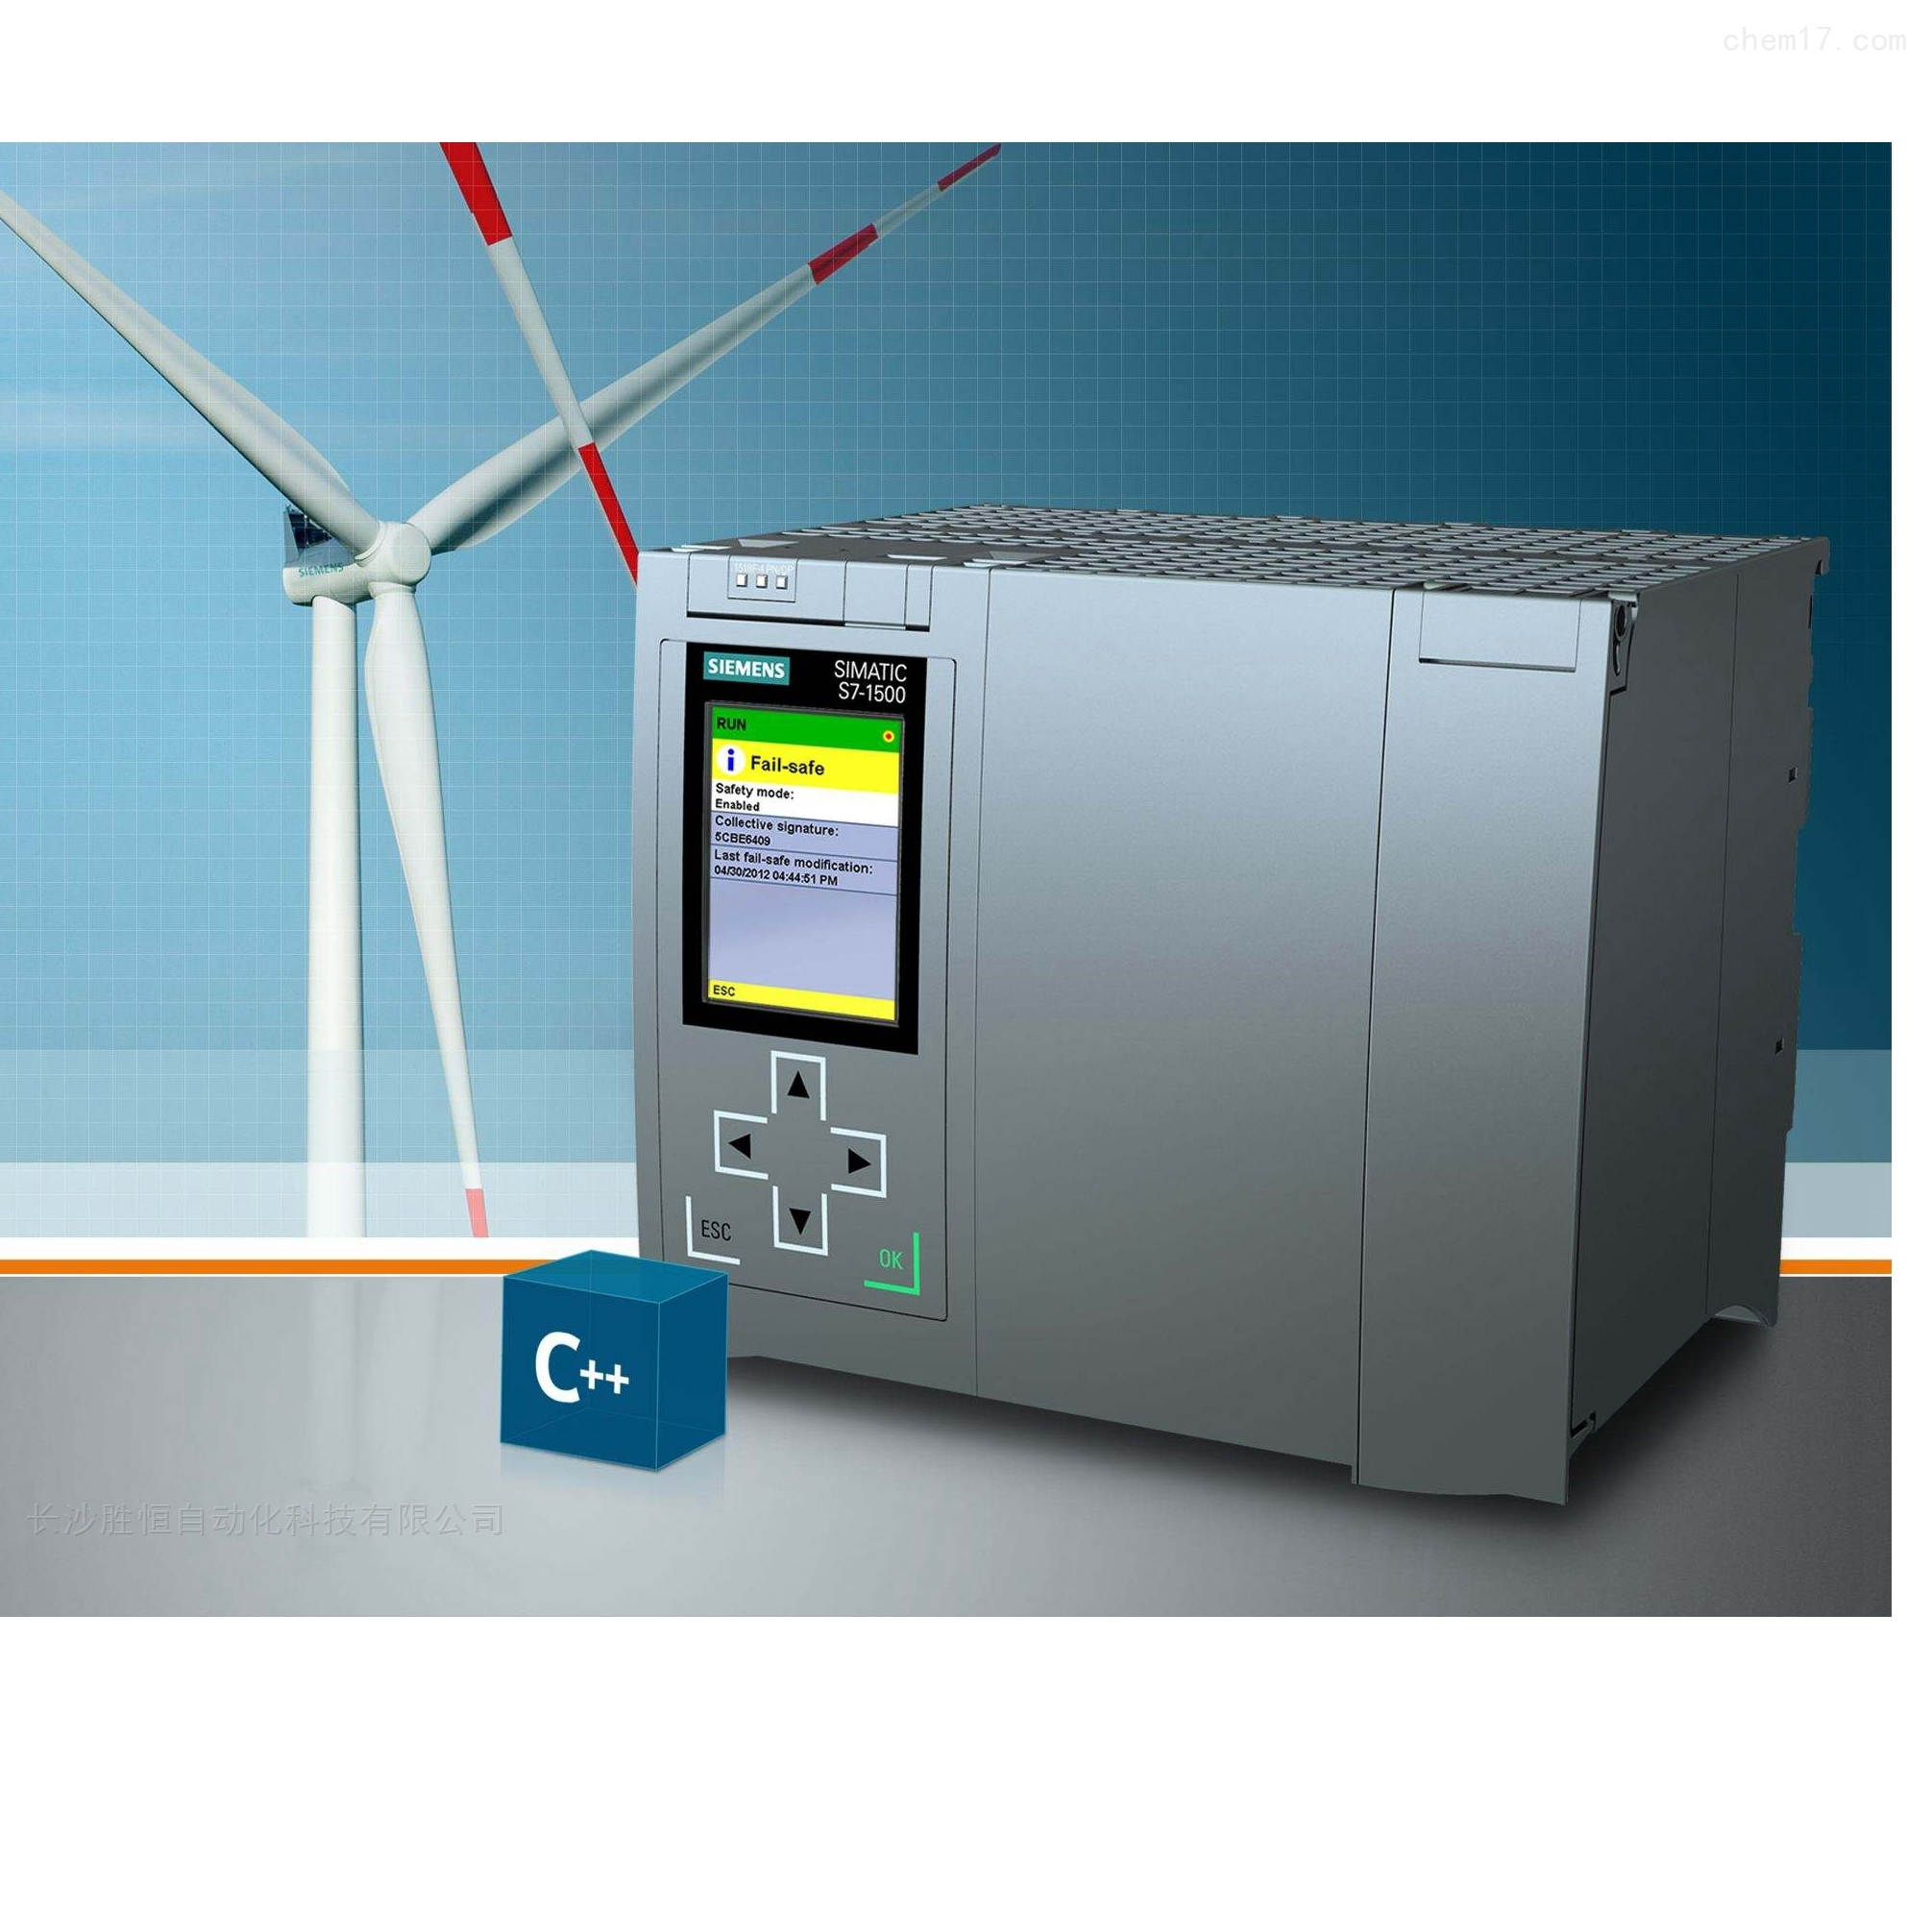 西门子电源模块6ES7194-4BA00-0AA0